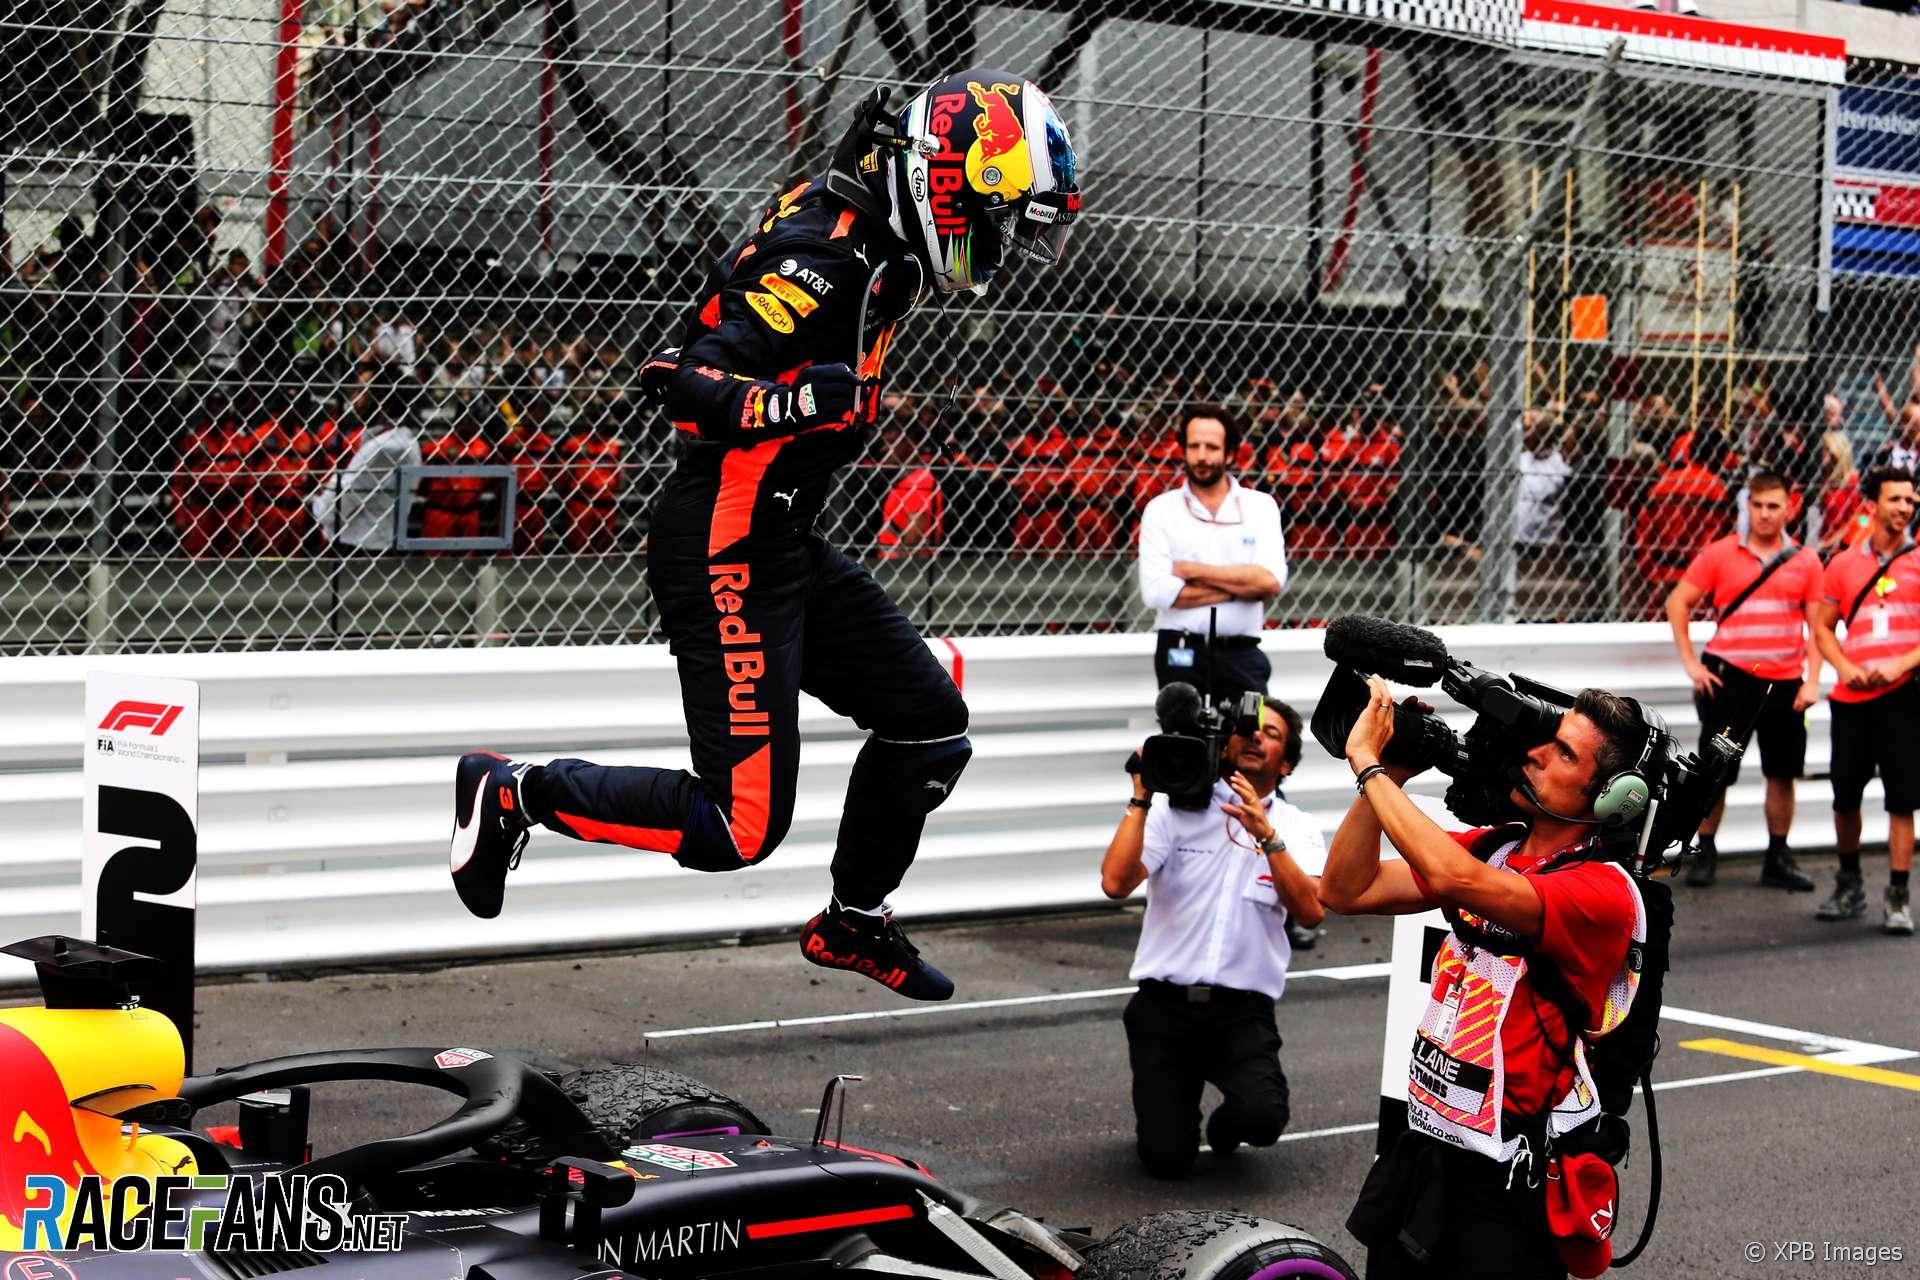 2018 Monaco Grand Prix In Pictures Racefans